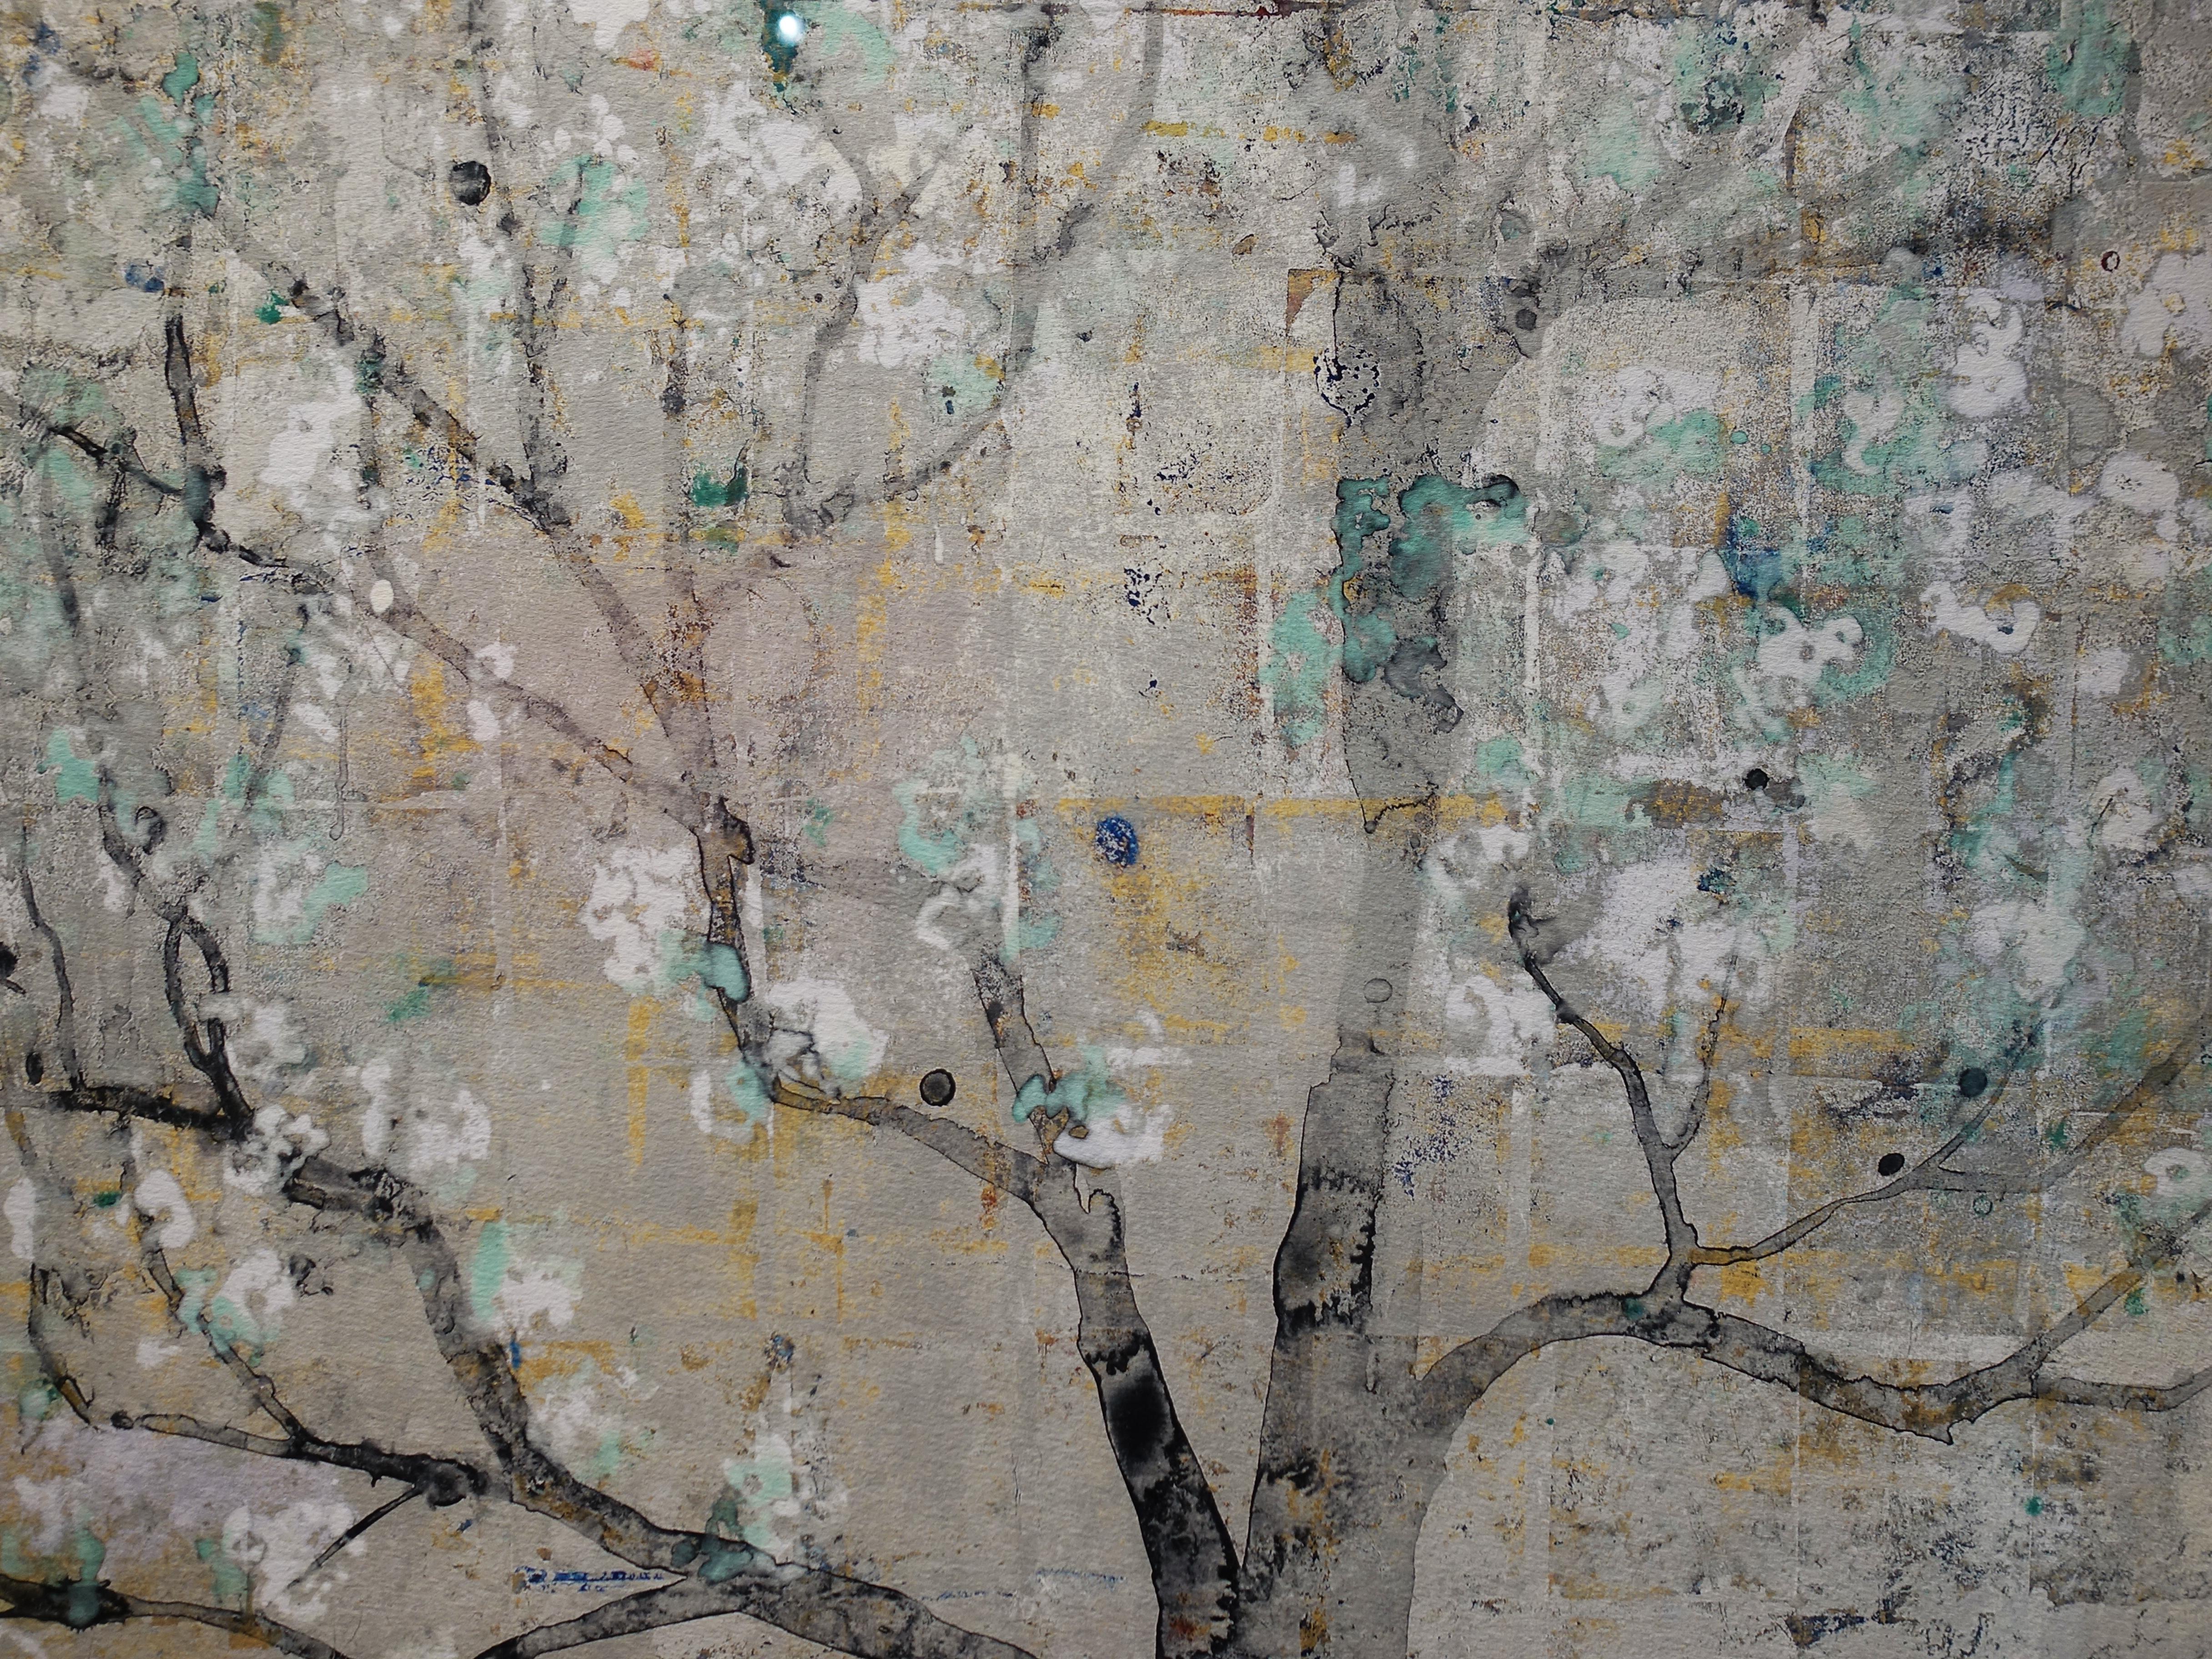 Makoto Fujimura,《Ki-Seki(Miracle)》細節,152.4 x 121.92 cm,藝術版畫,2045。